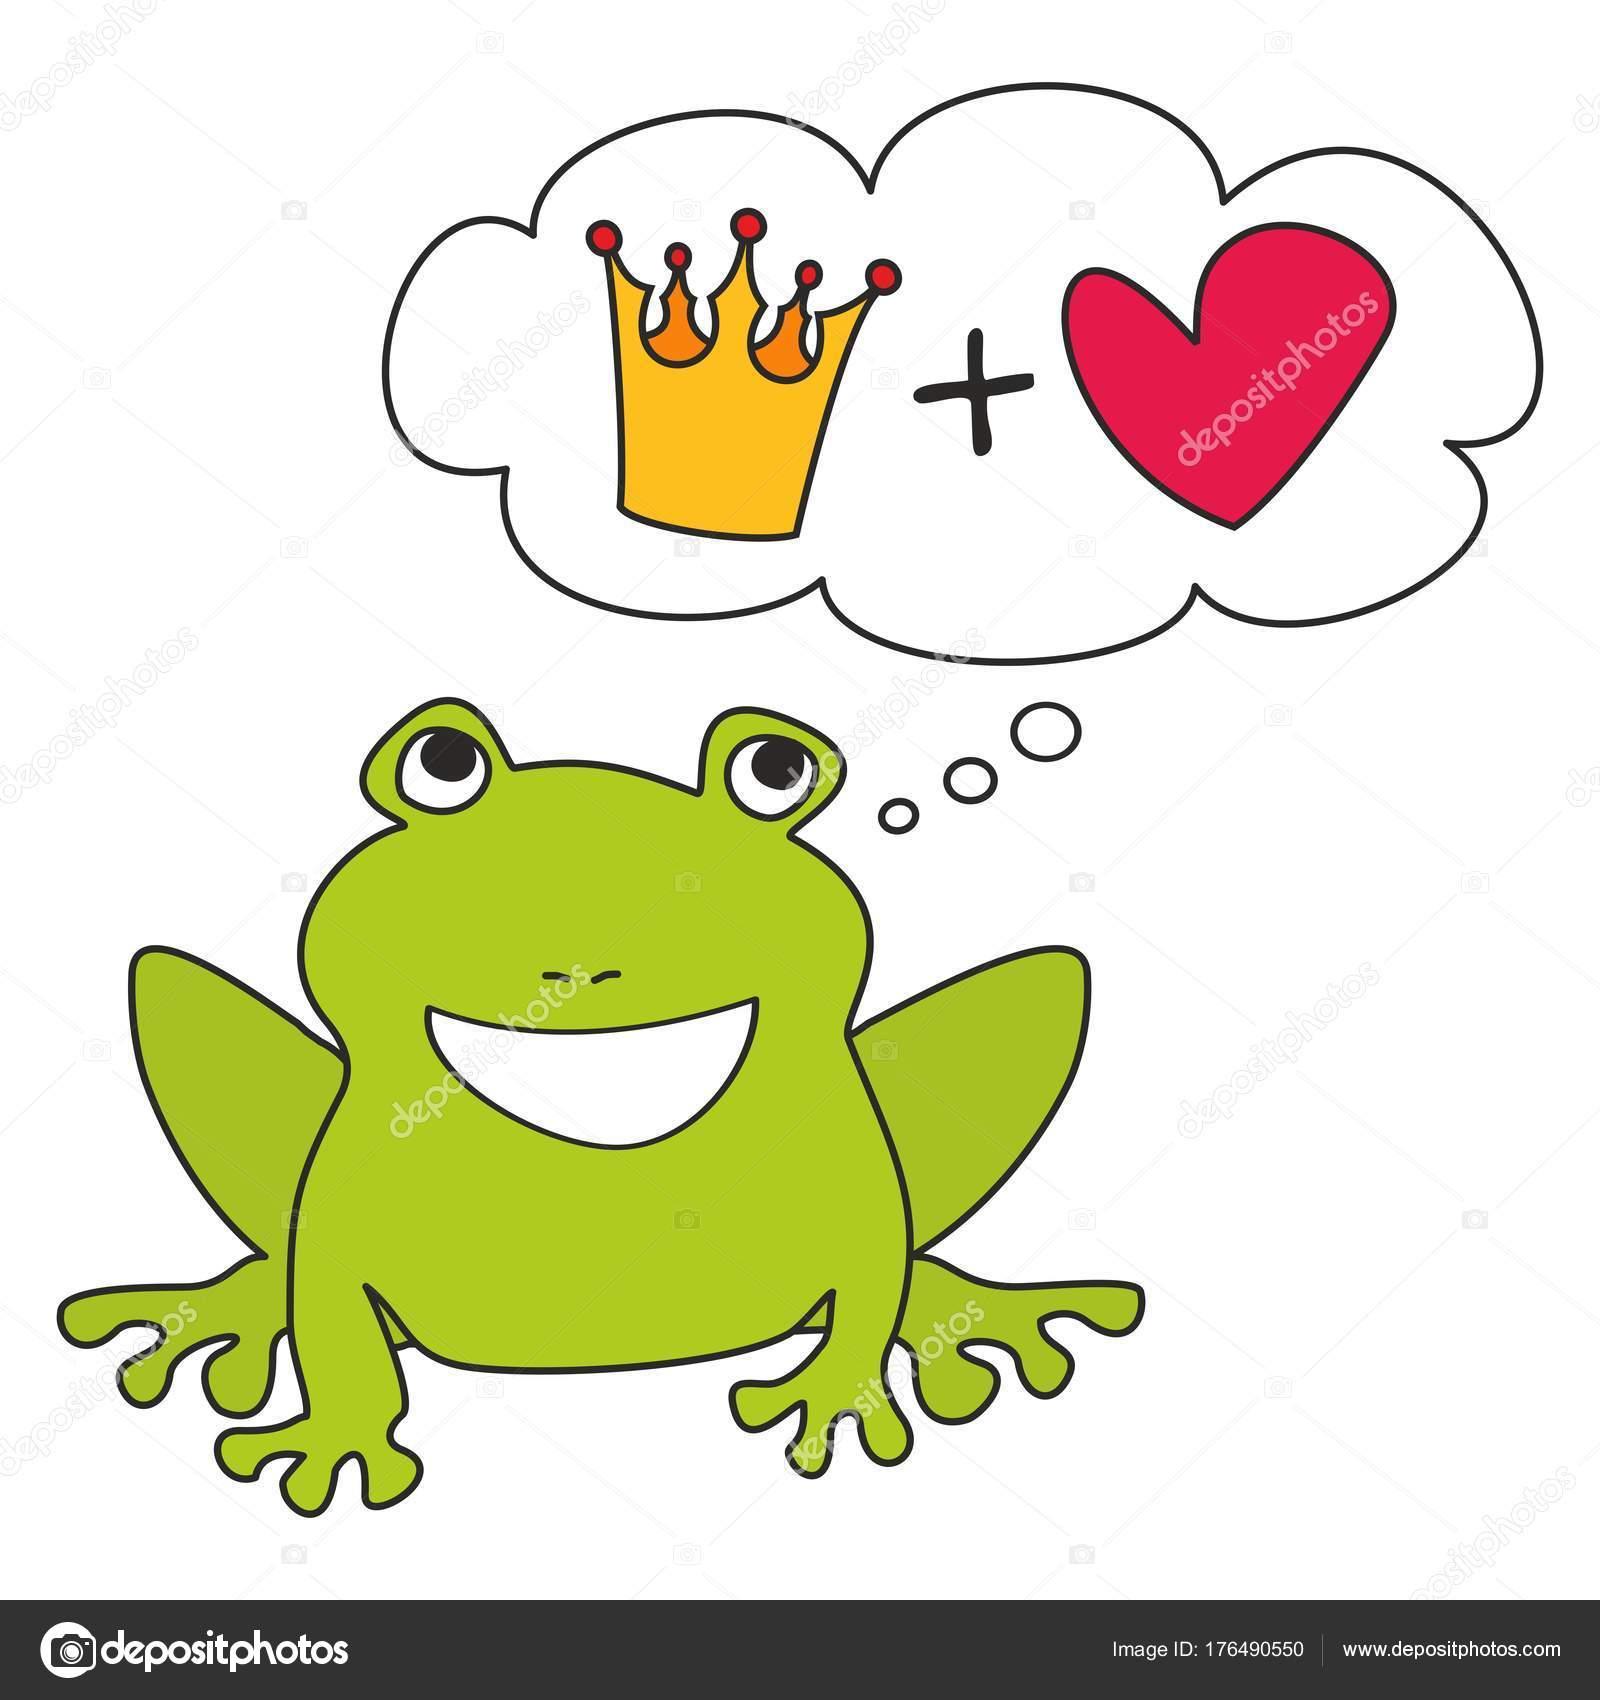 Grenouille Couronne prince princesse grenouille verte rêver couronne amour illustration